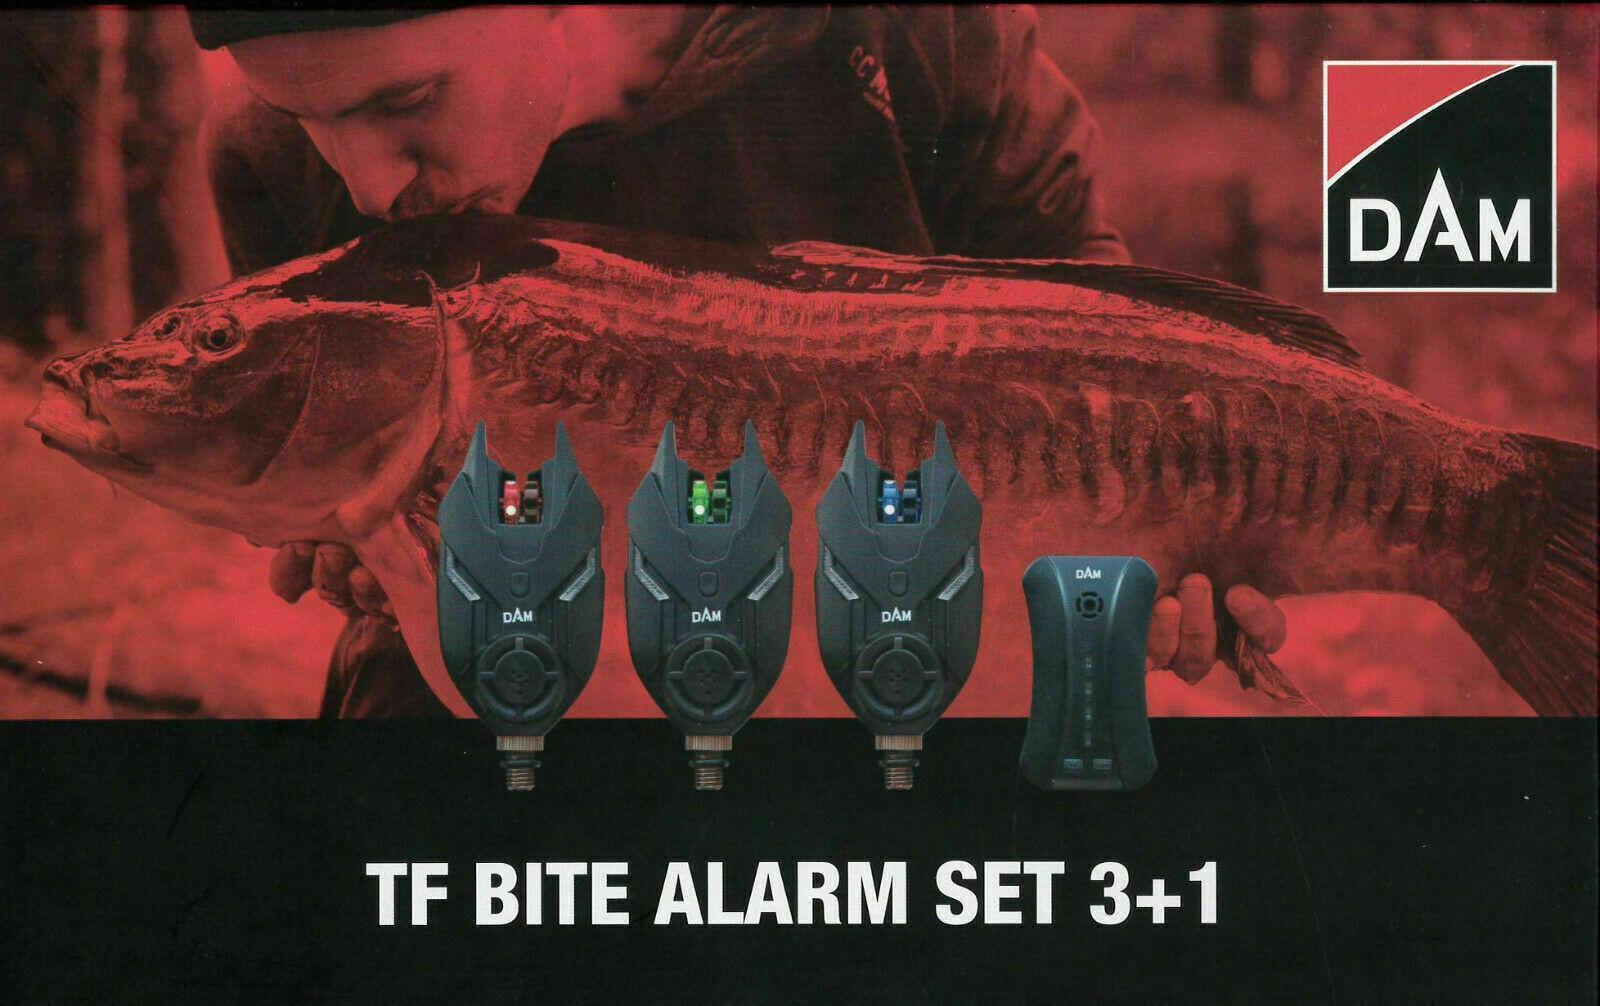 DAM TF Wireless Bite Alarm Set 3 + 1 Or 4+1  In Case Fishing